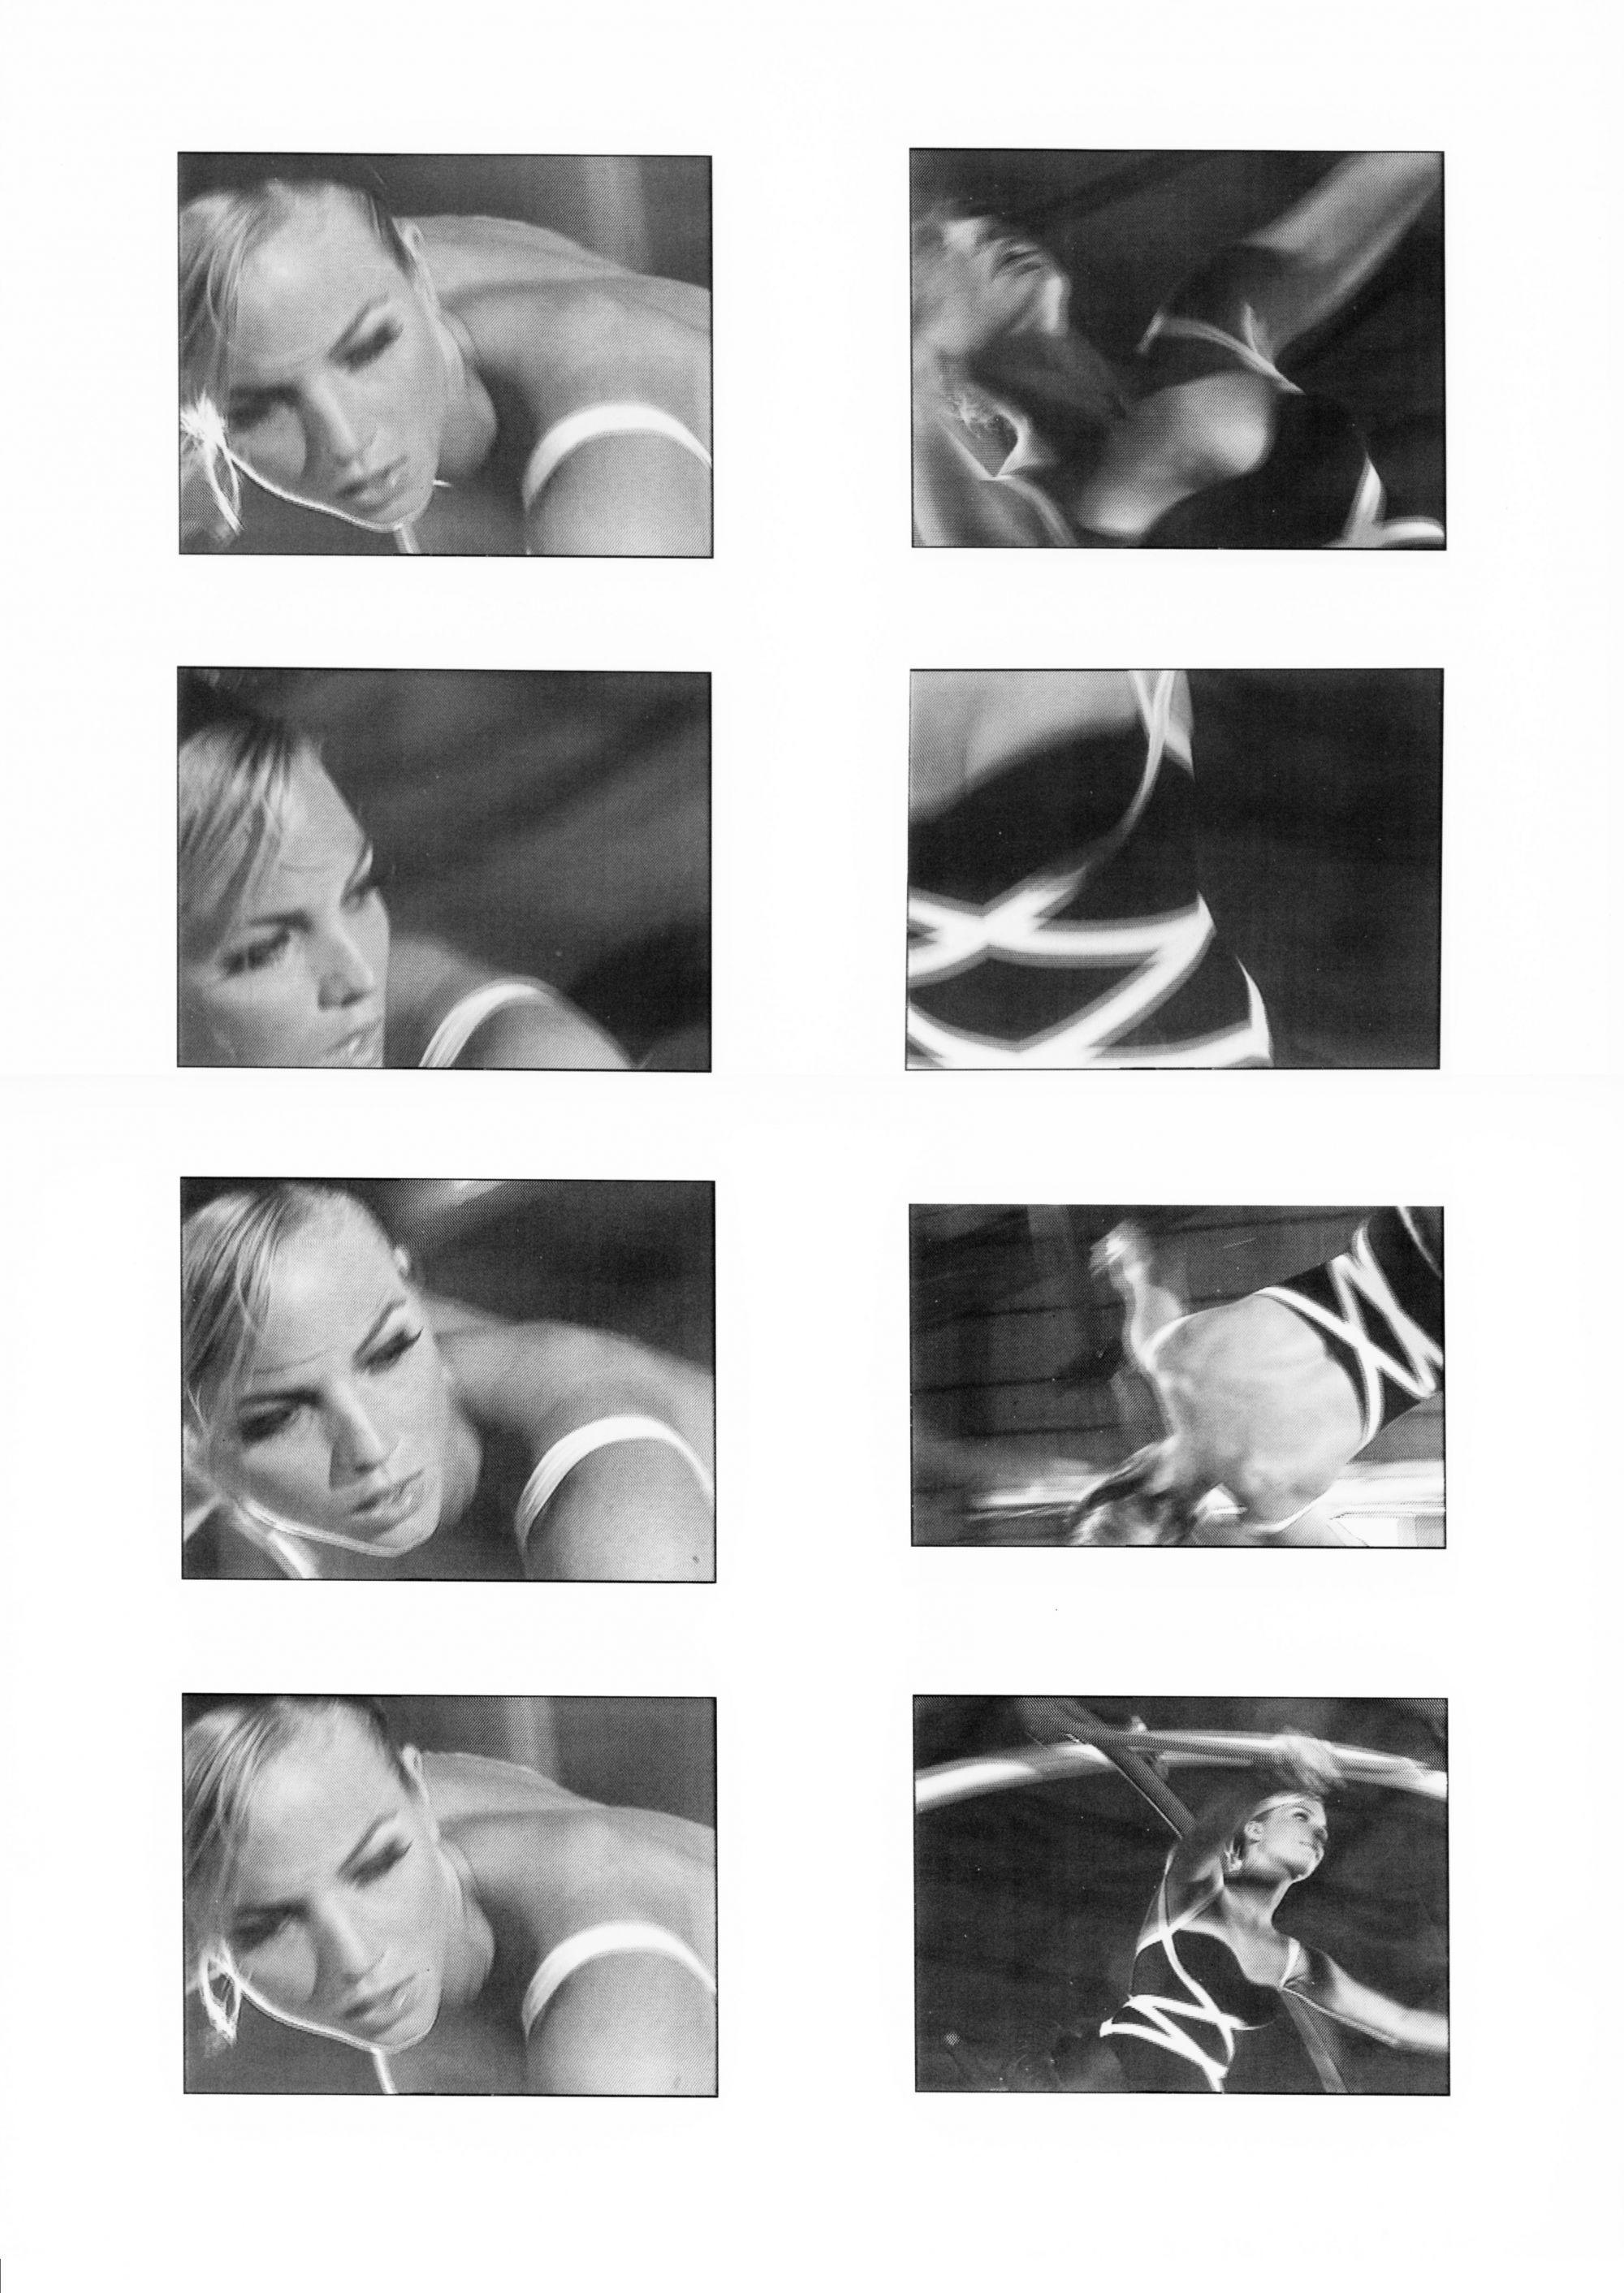 1991 Film by Daniel Minahan - model Rachel Williams